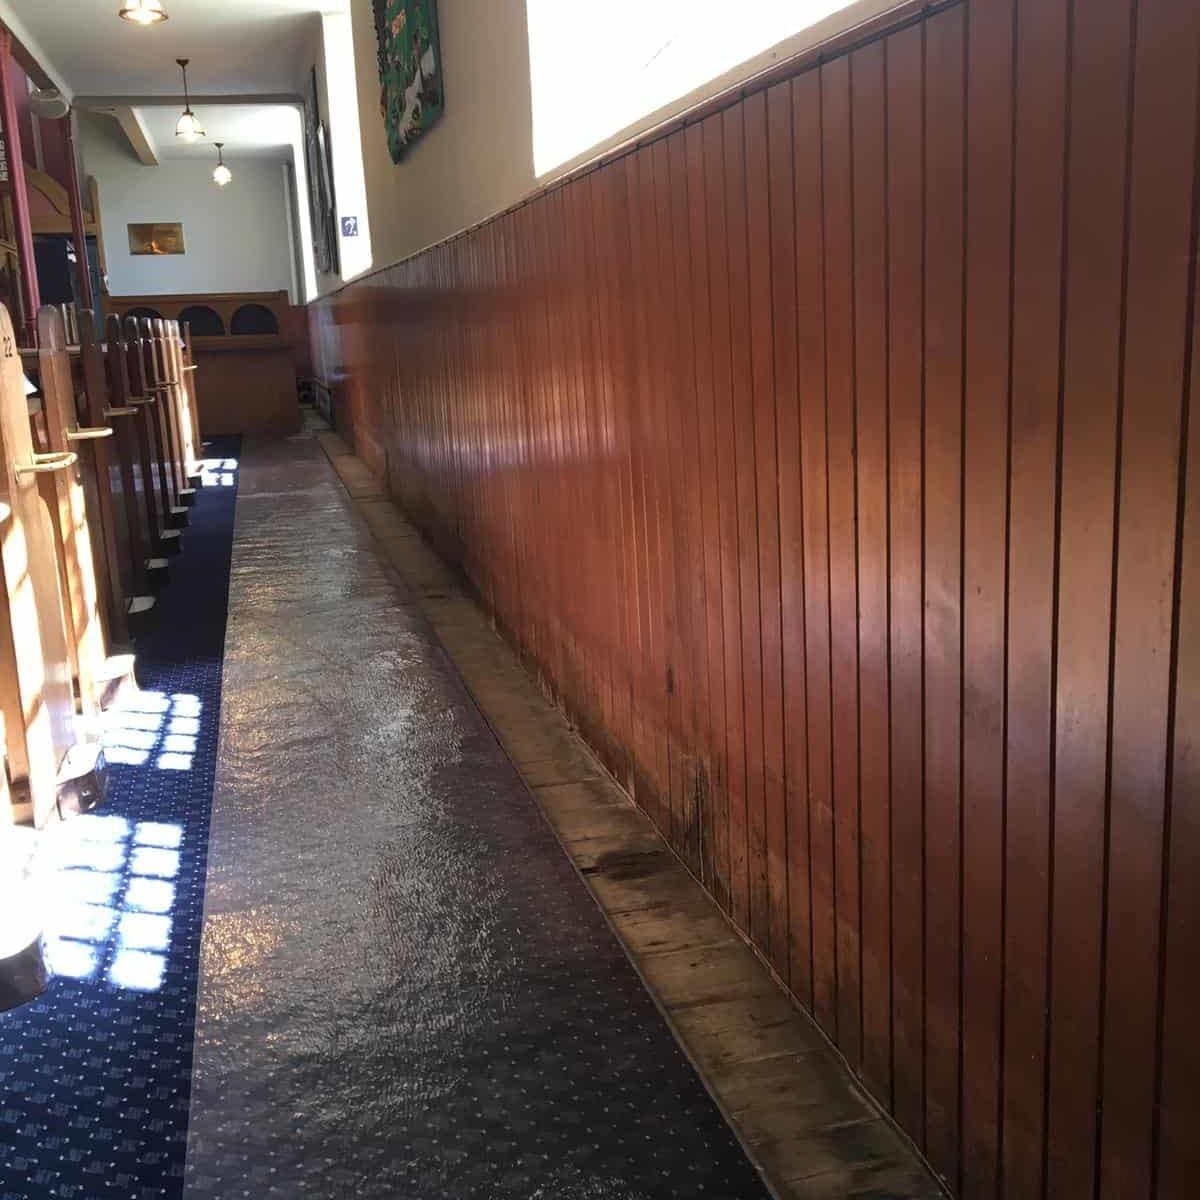 Photos from Bishopton Parish Church heating system 21